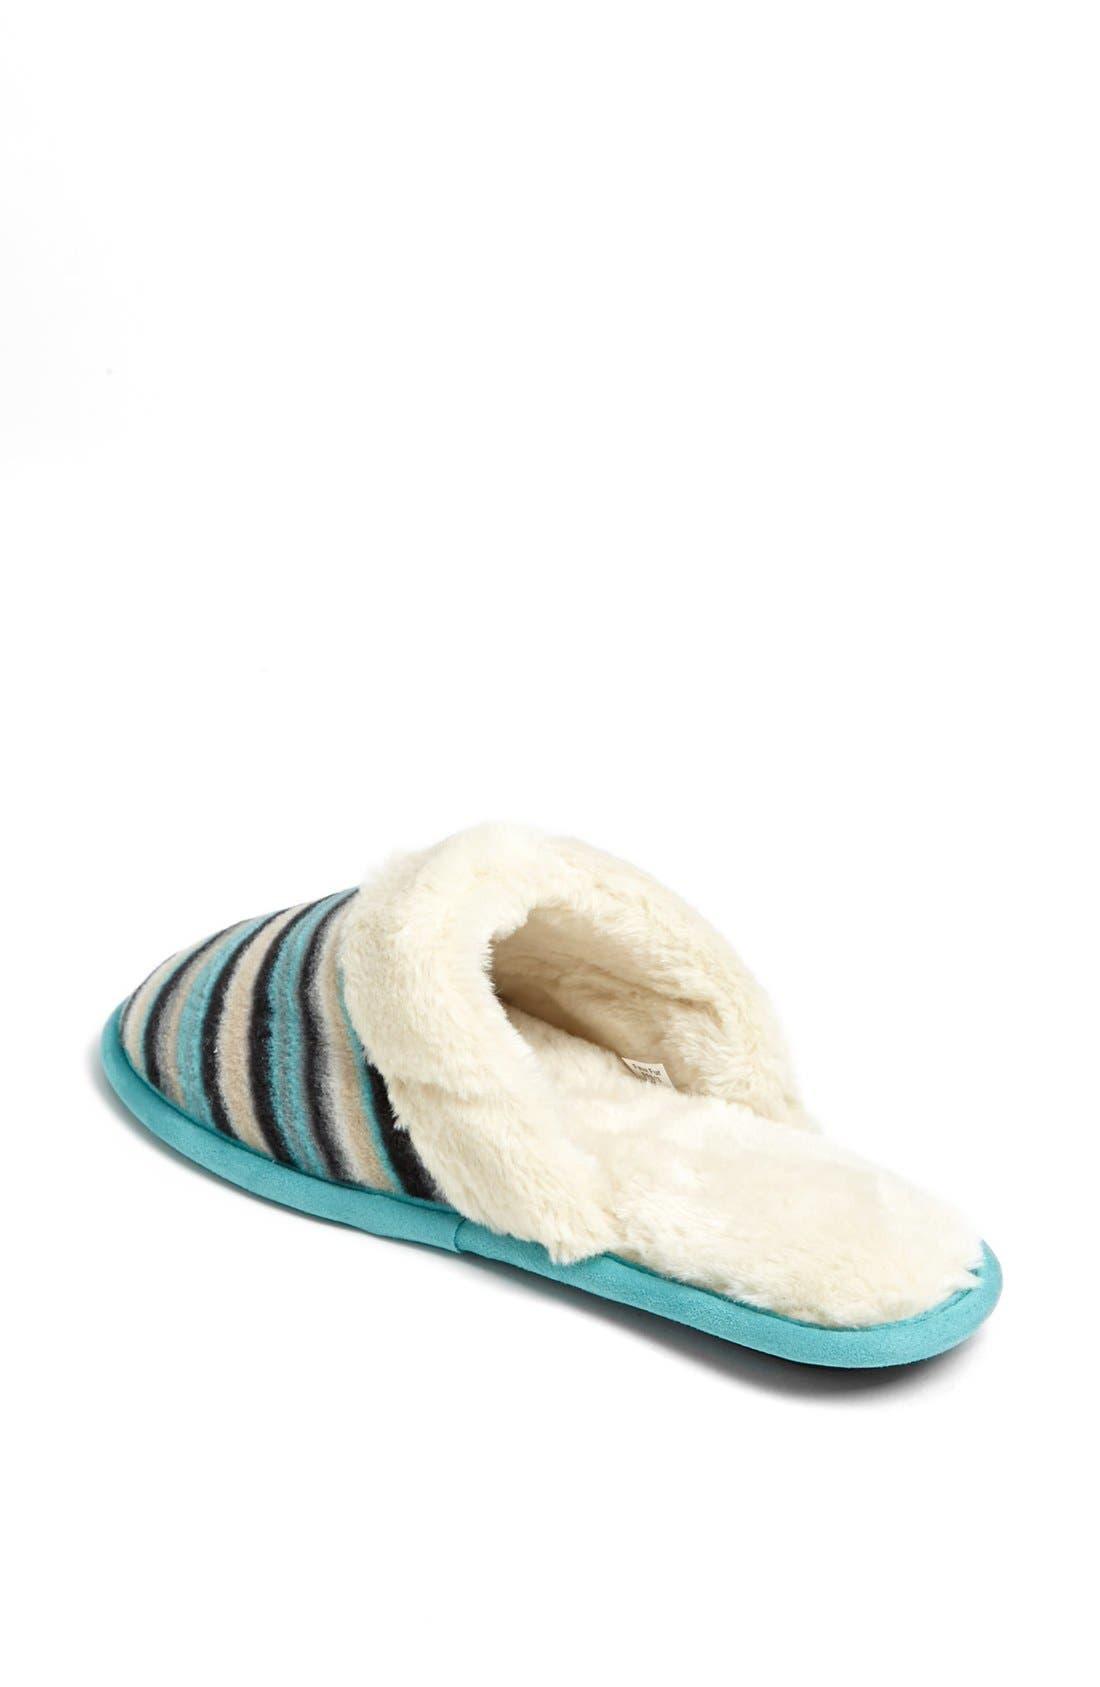 Alternate Image 2  - Acorn 'Polar Scuff' Slipper